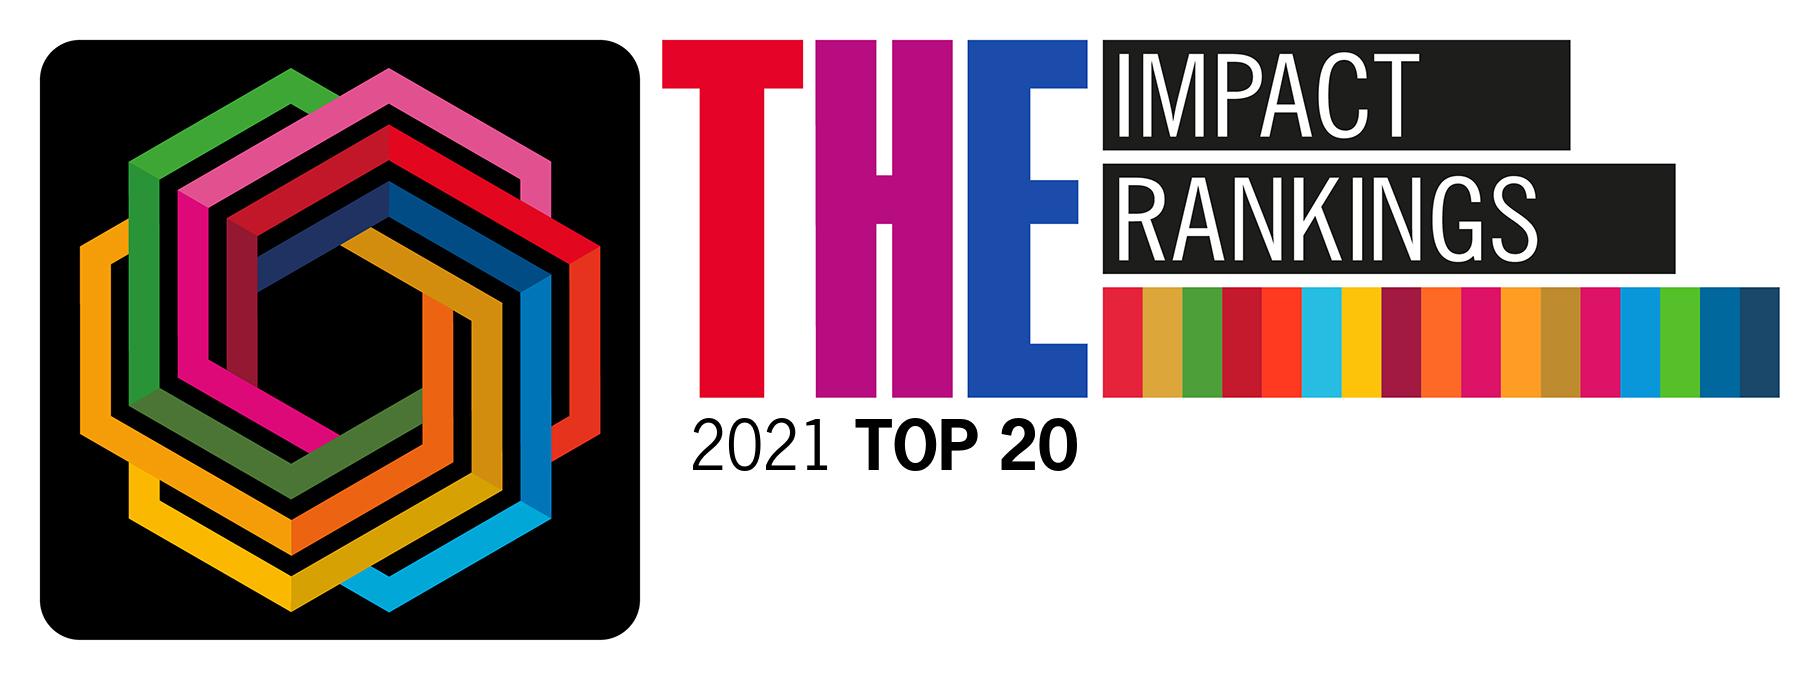 THE Impact Rankings 2021 Top 20